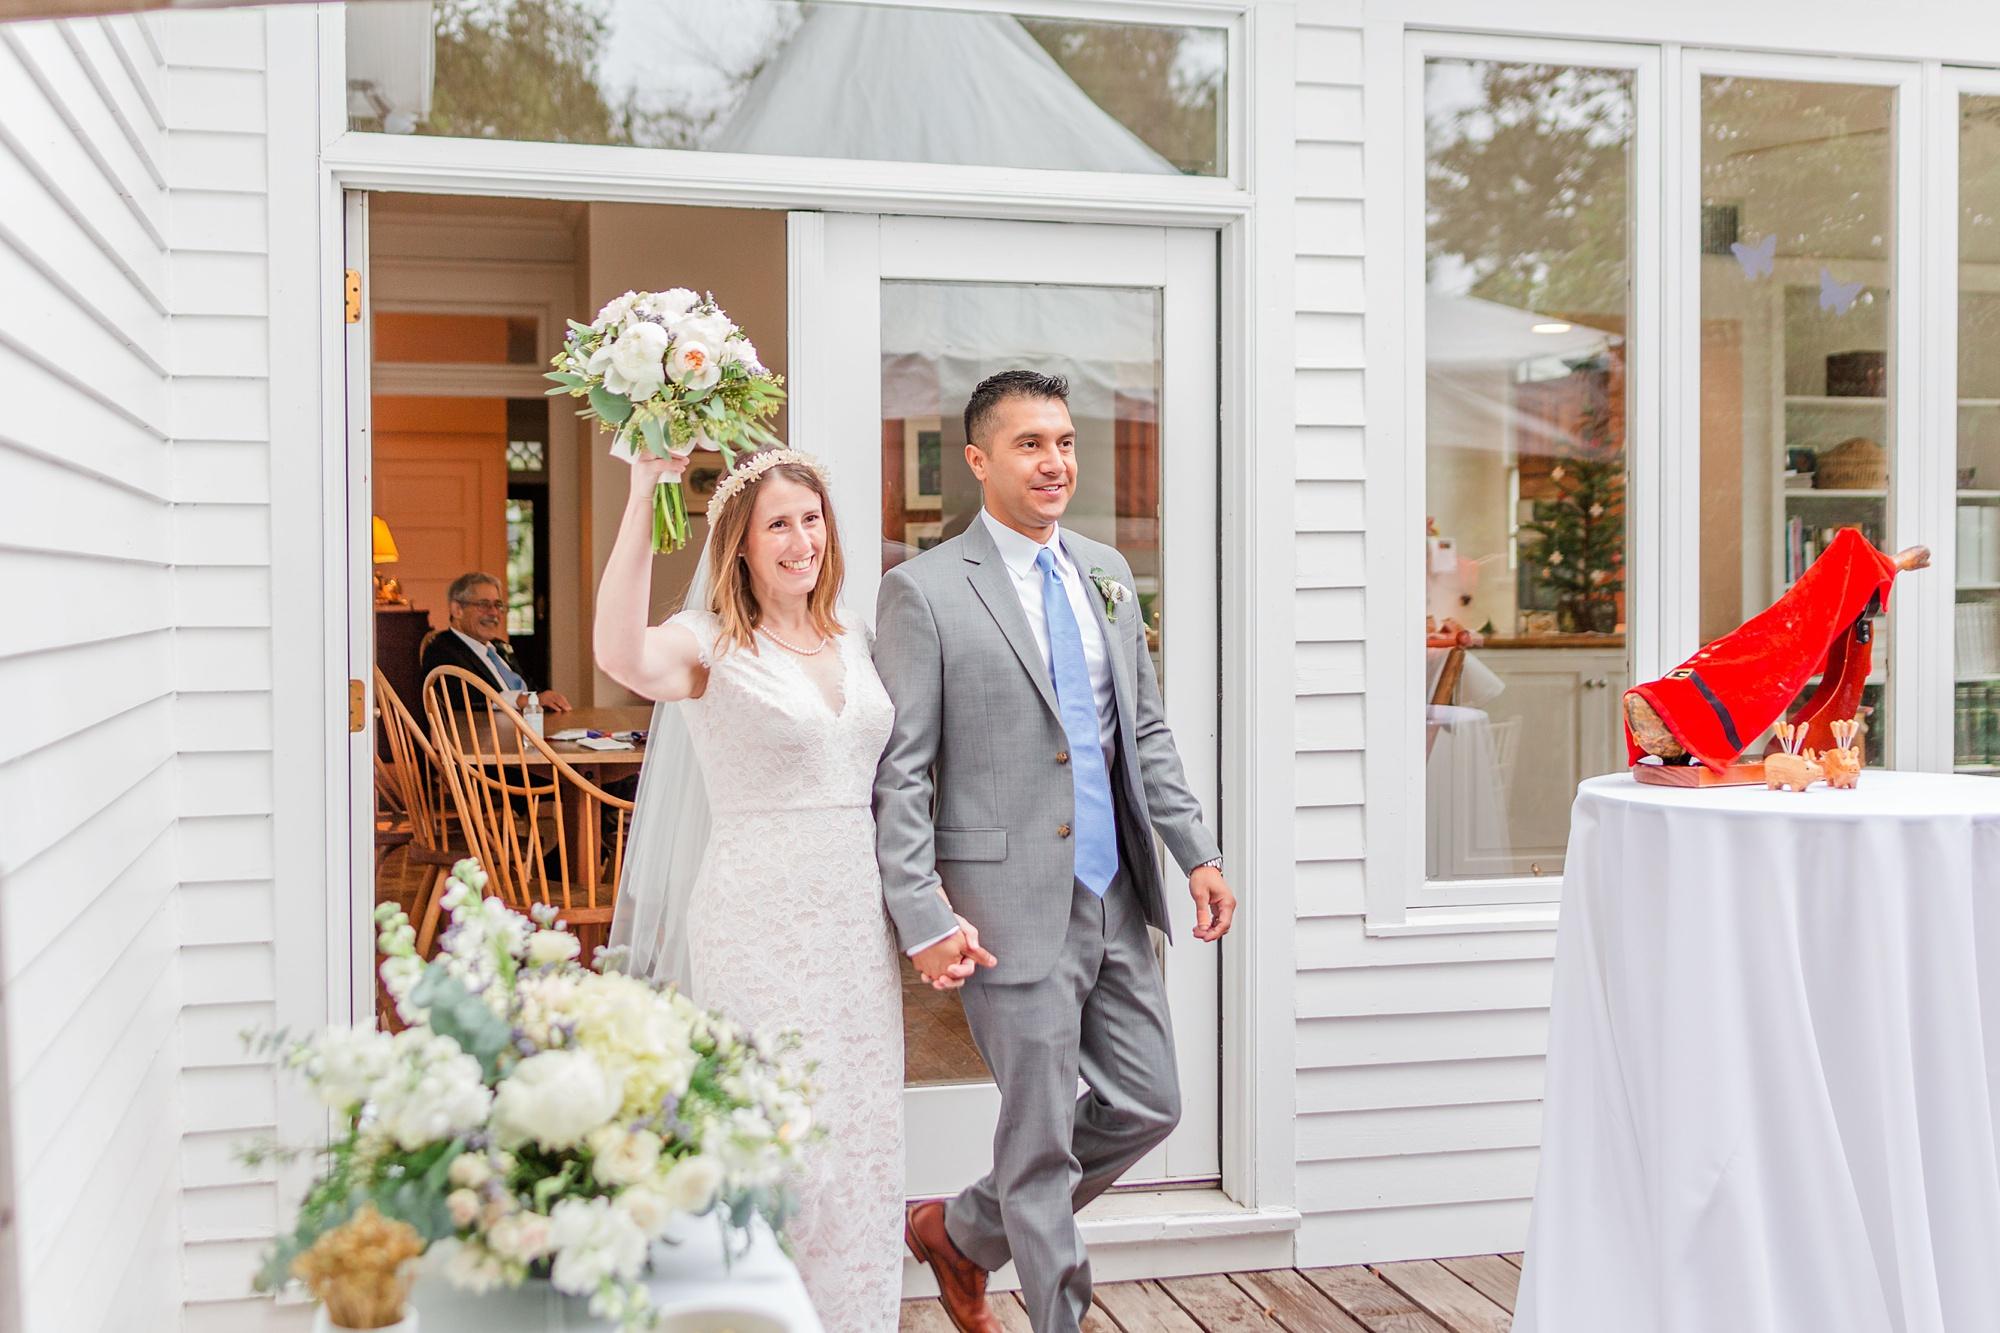 bride and groom enter intimate Springhill wedding reception